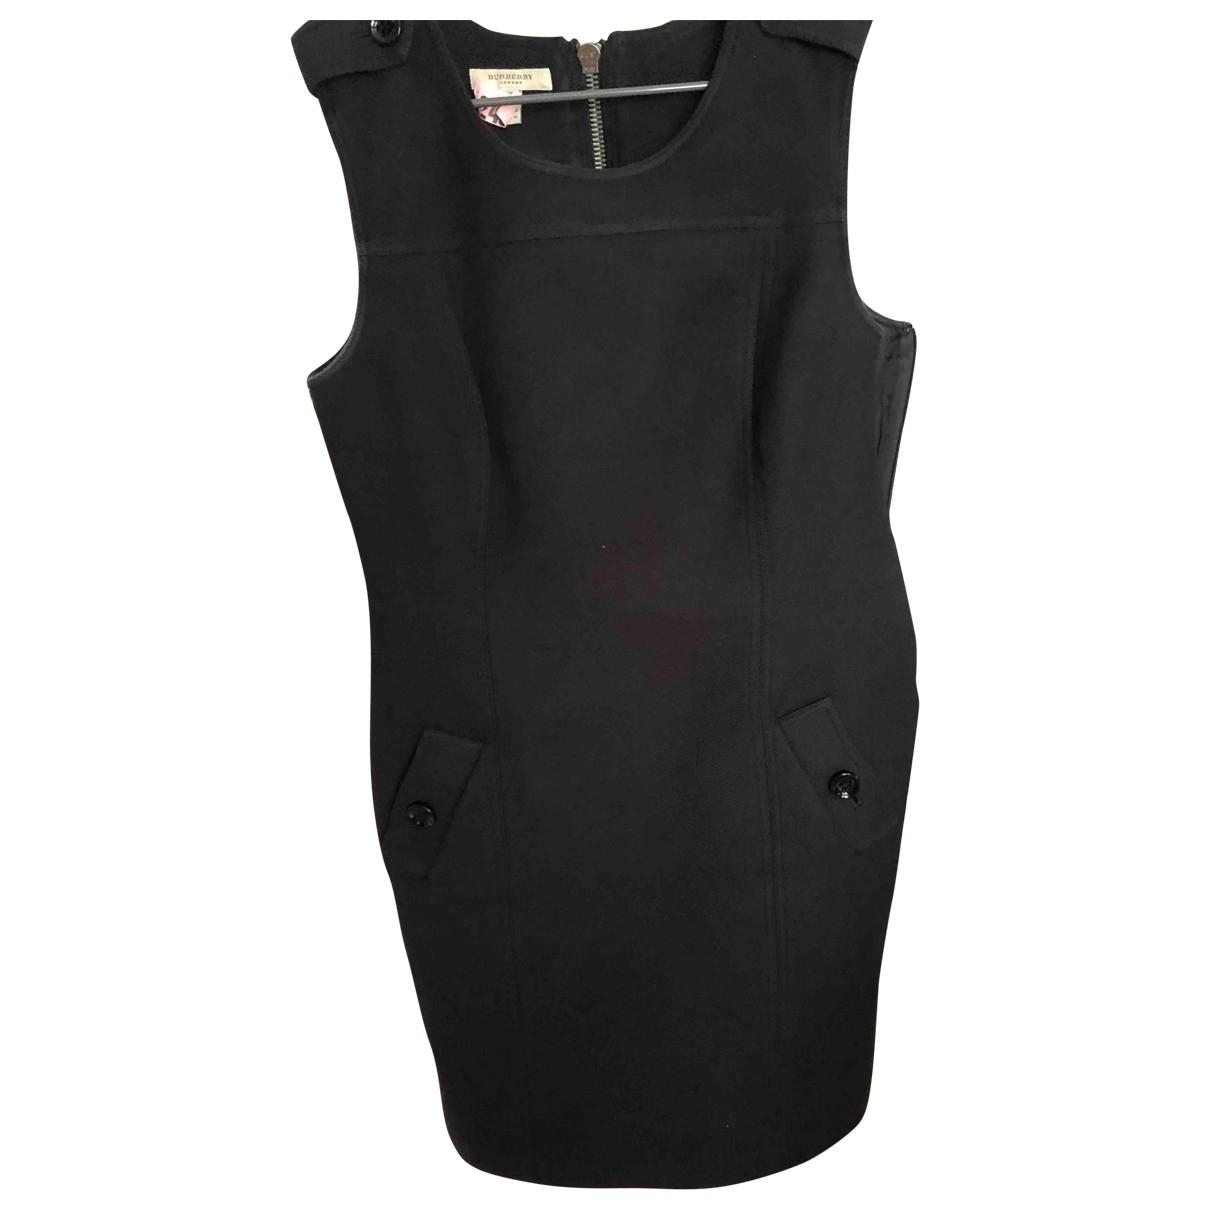 Burberry \N Black Cotton dress for Women 40 FR